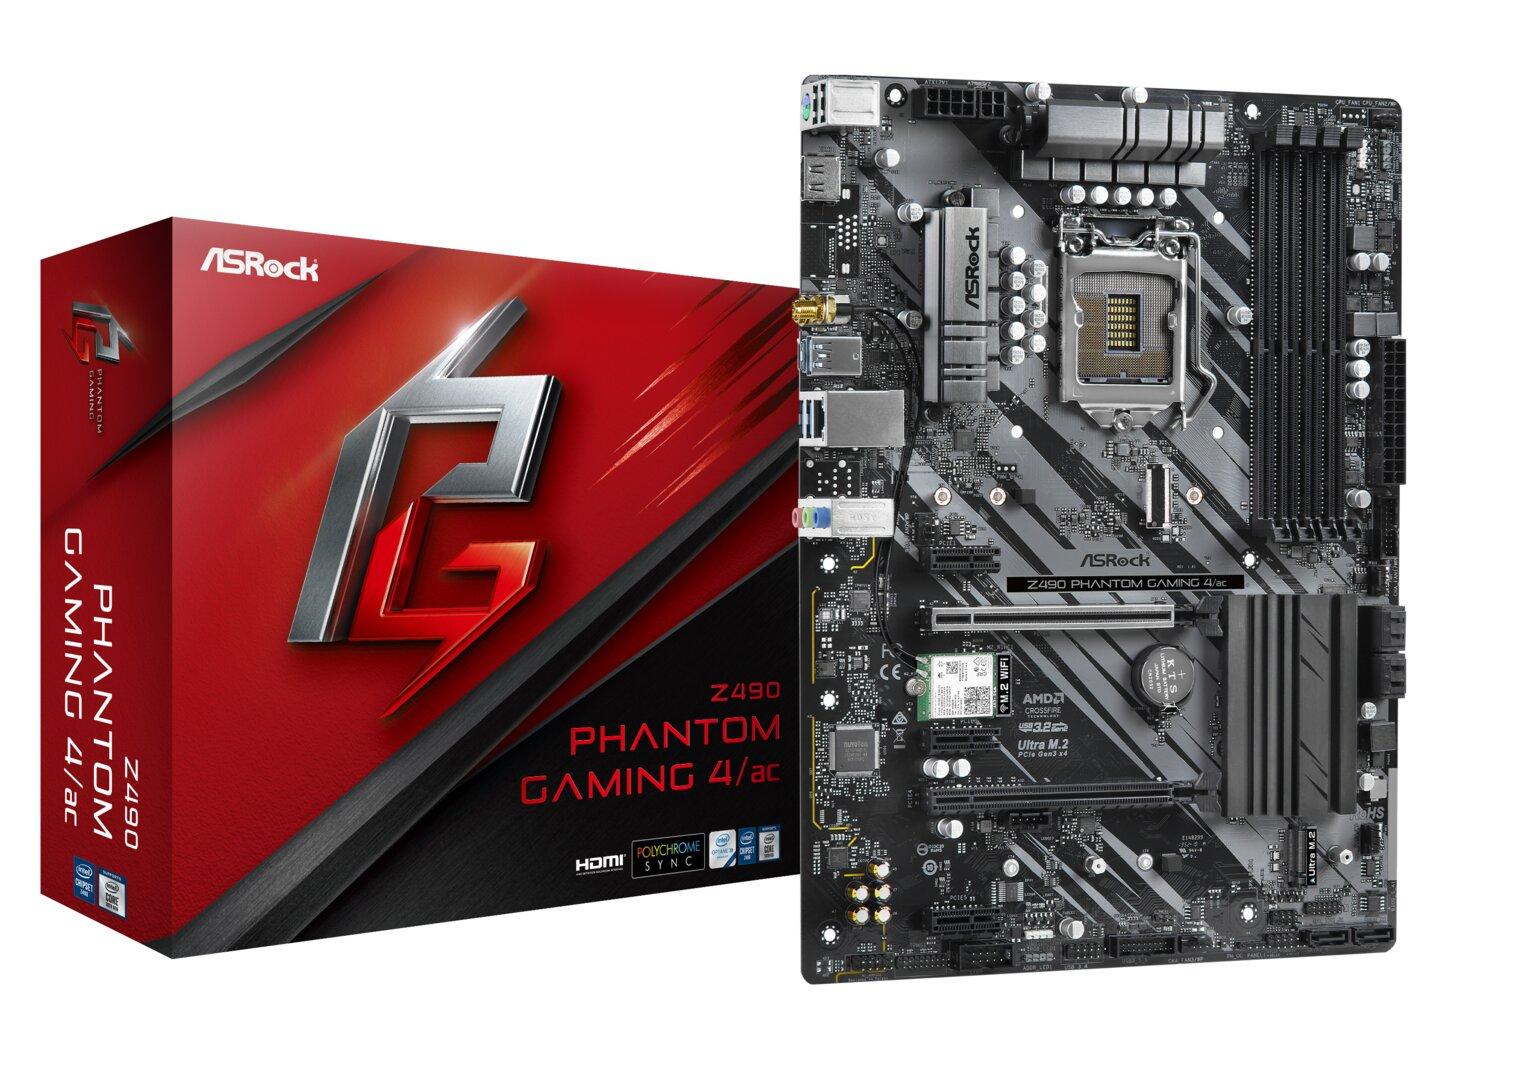 ASRock Z490 Phantom Gaming 4 ac